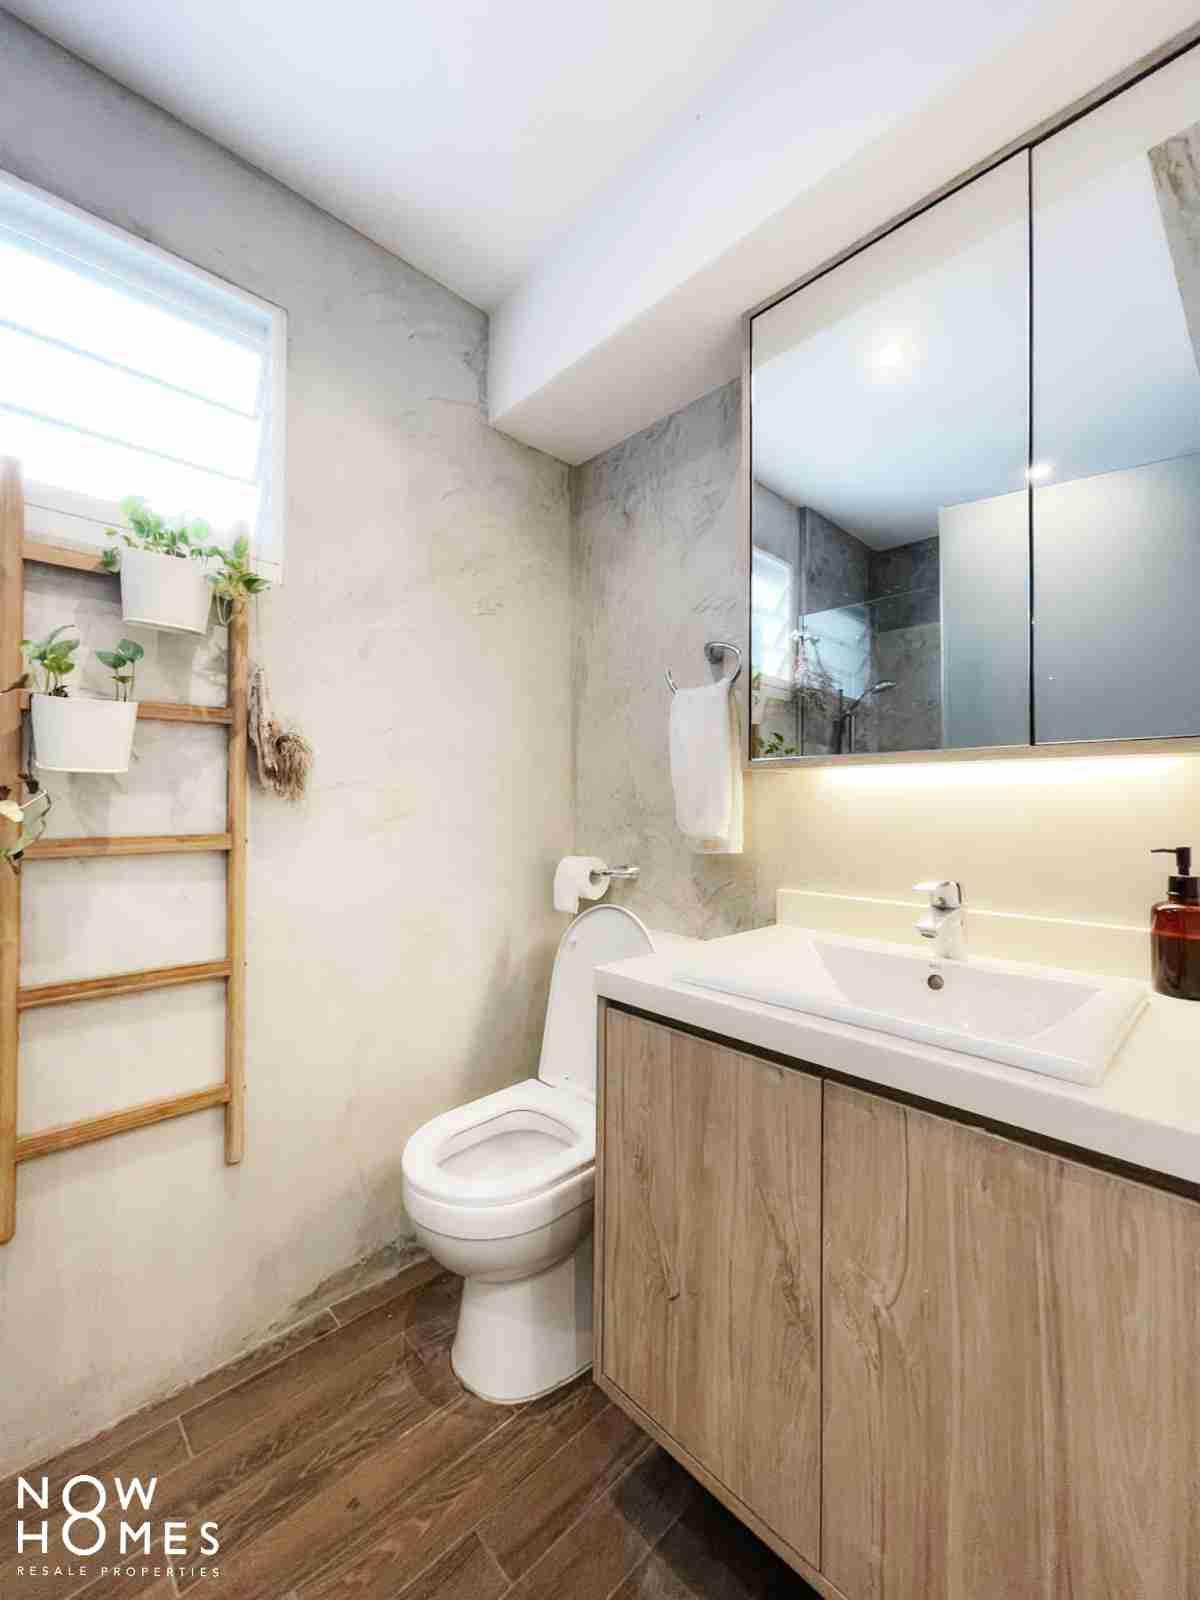 sengkang resale property - 288 compassvale - toilet